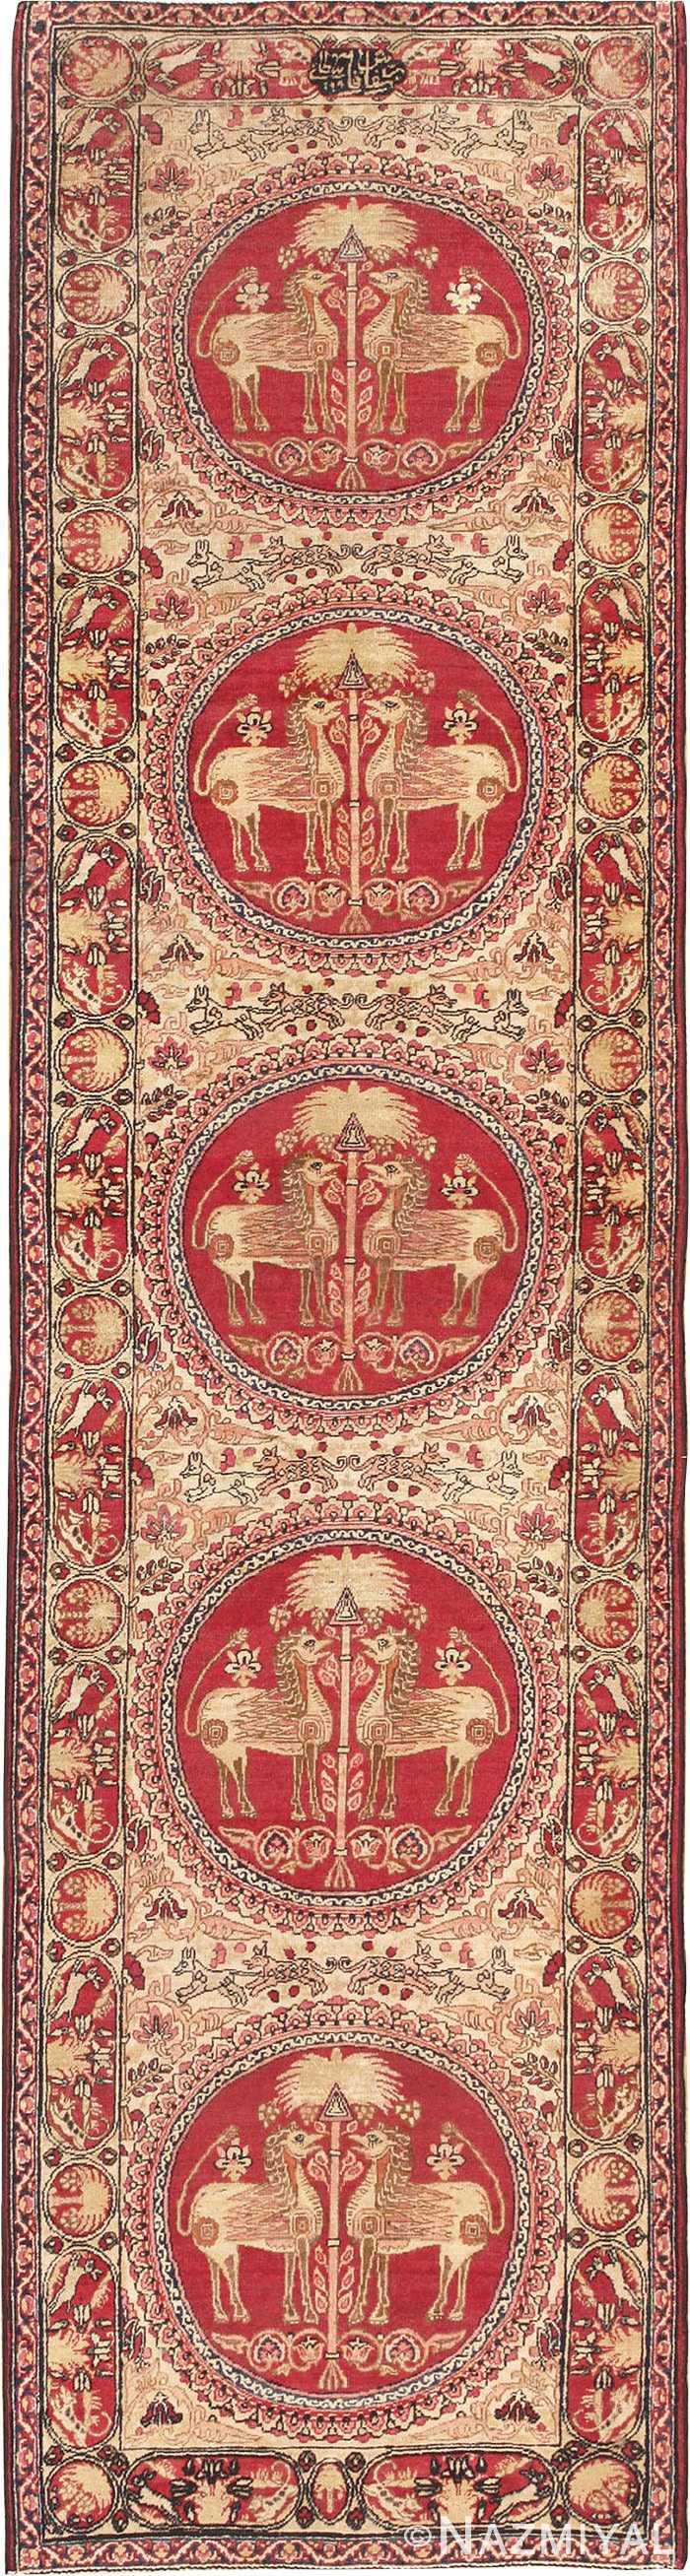 Antique Persian Kerman Runner Rug #45802 by Nazmiyal Antique Rugs